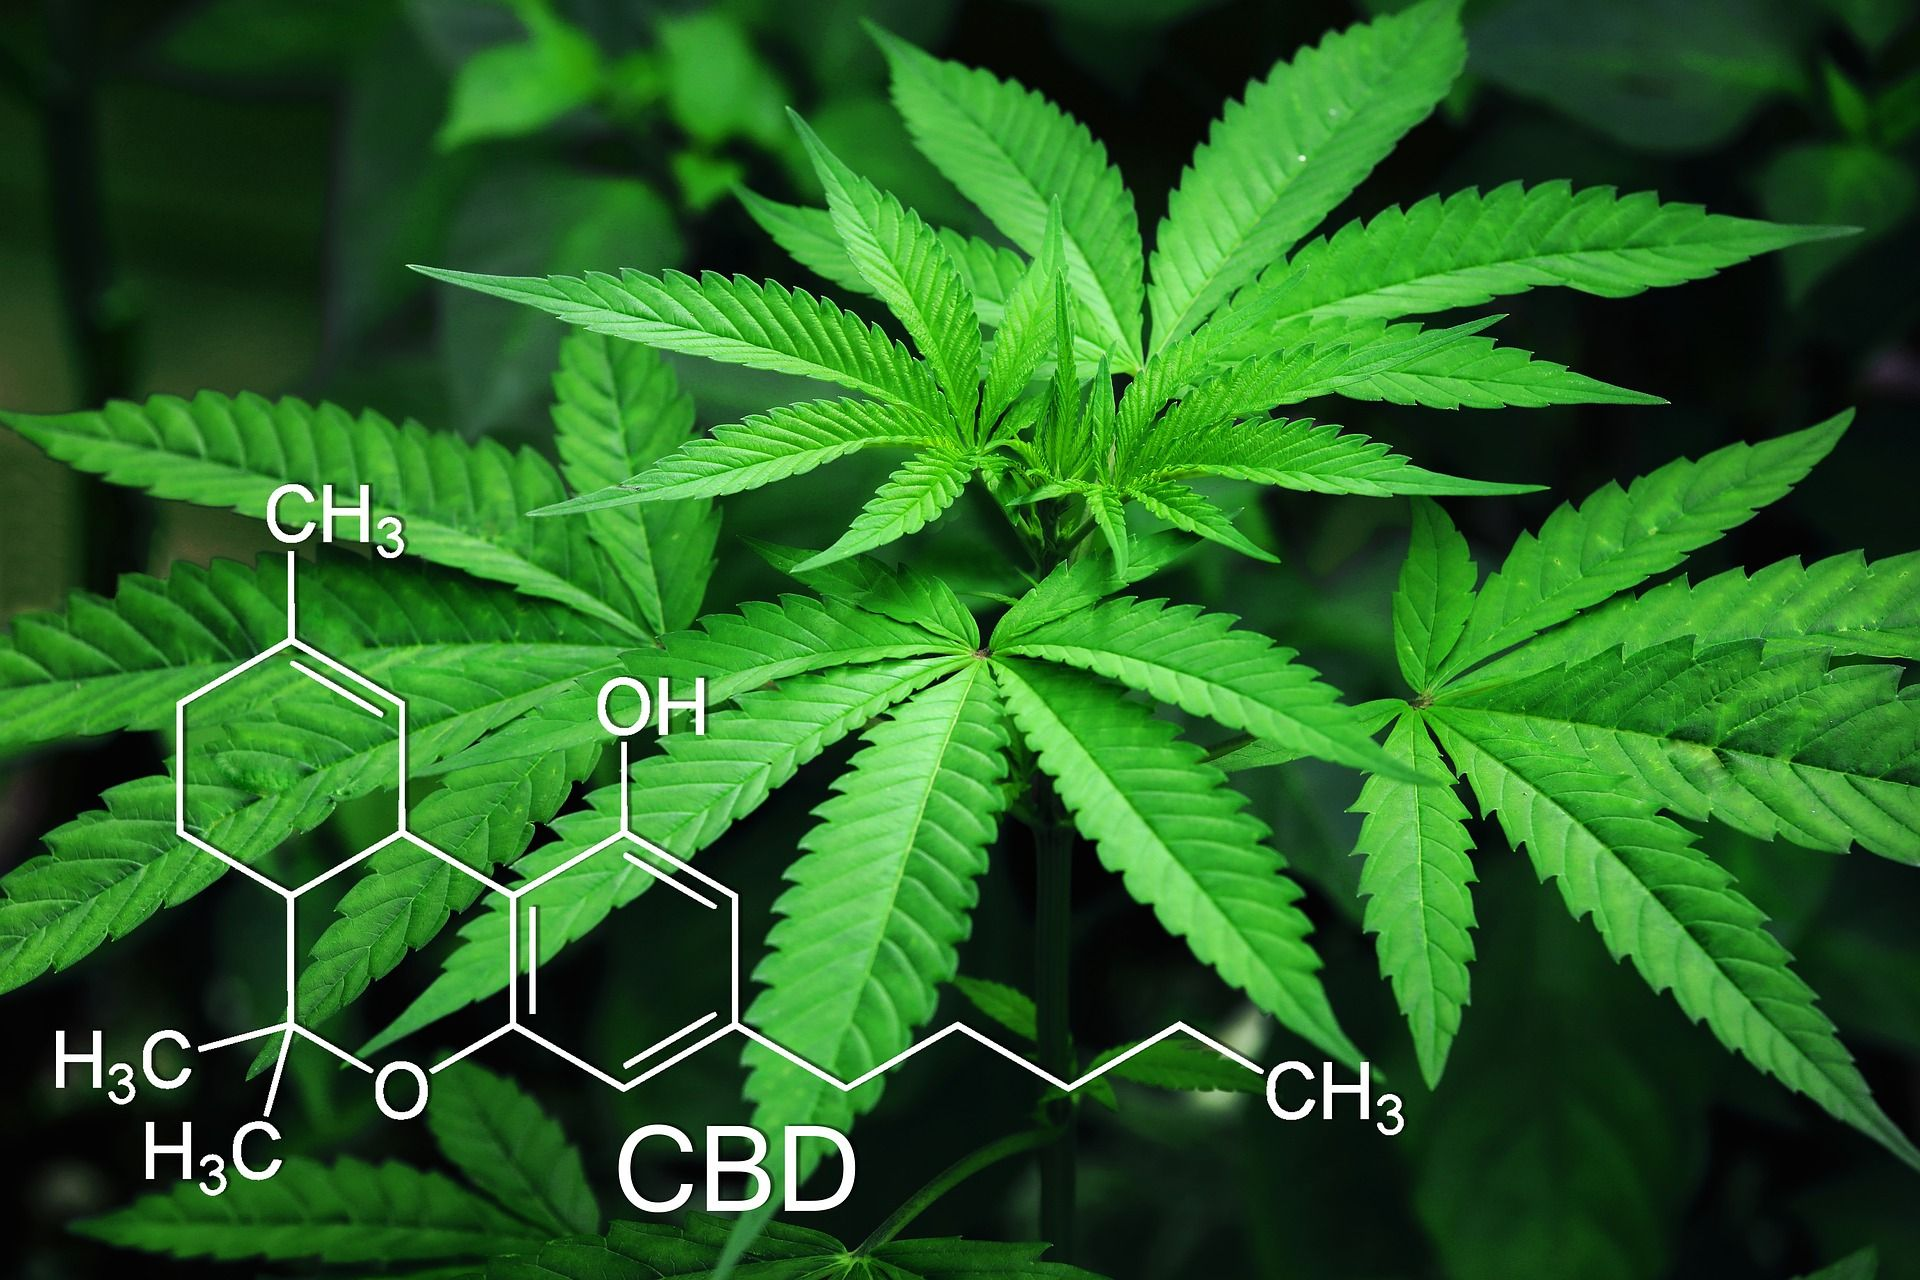 marihuana con CBD y sexo con escorts